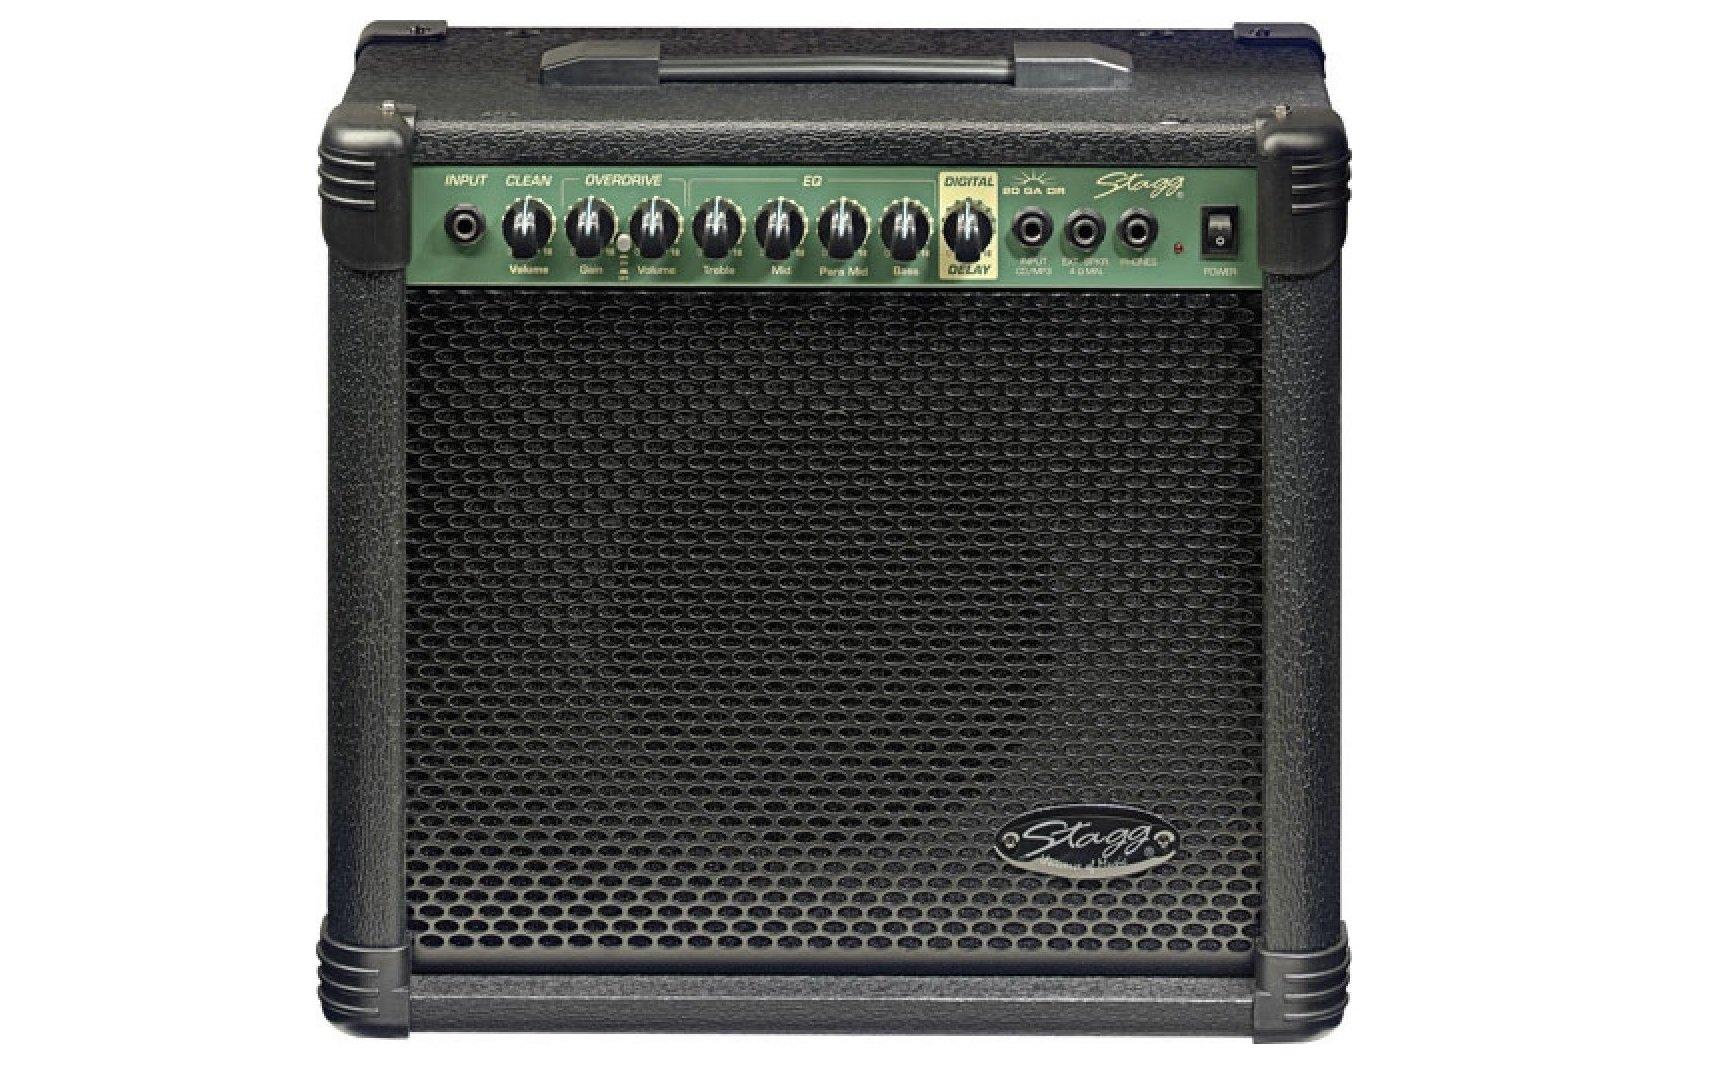 Stagg 15GA Guitar Amplifier